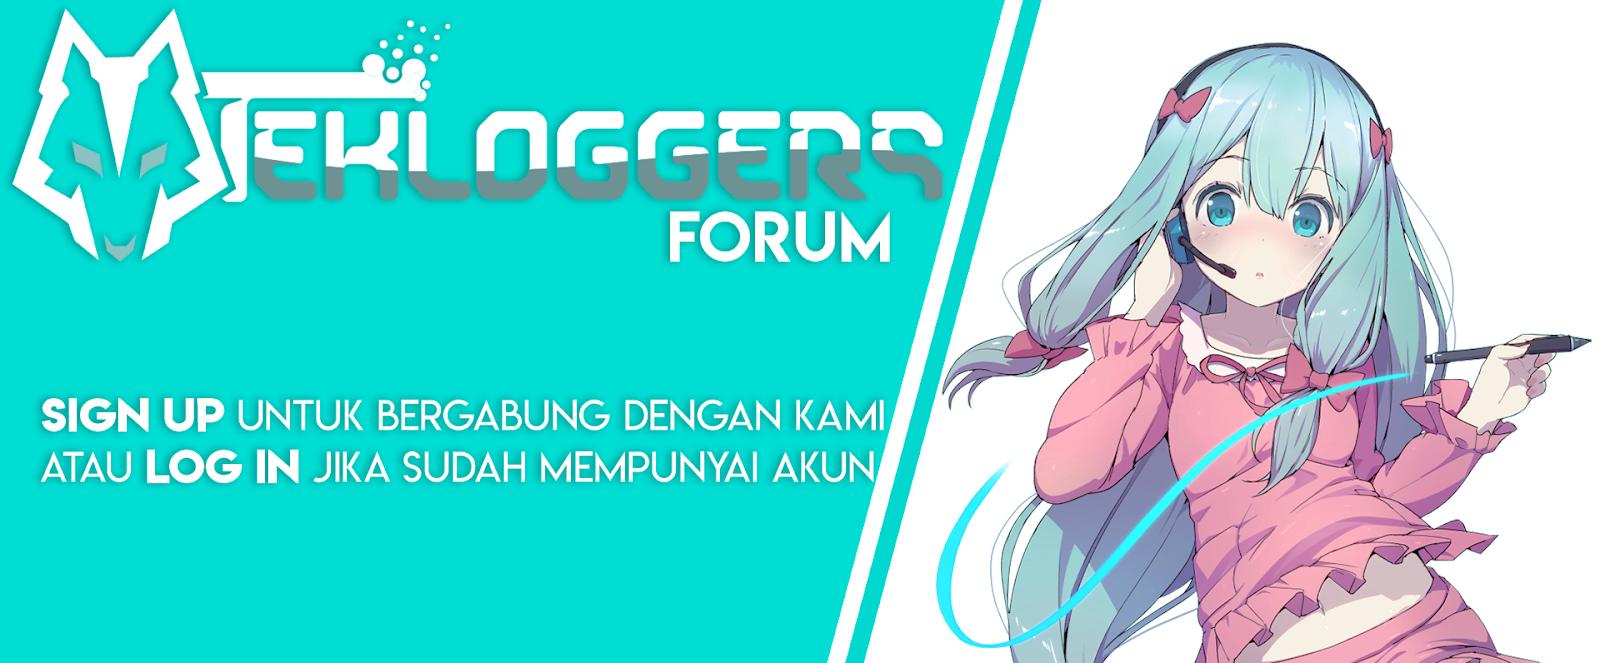 Komunitas Forum